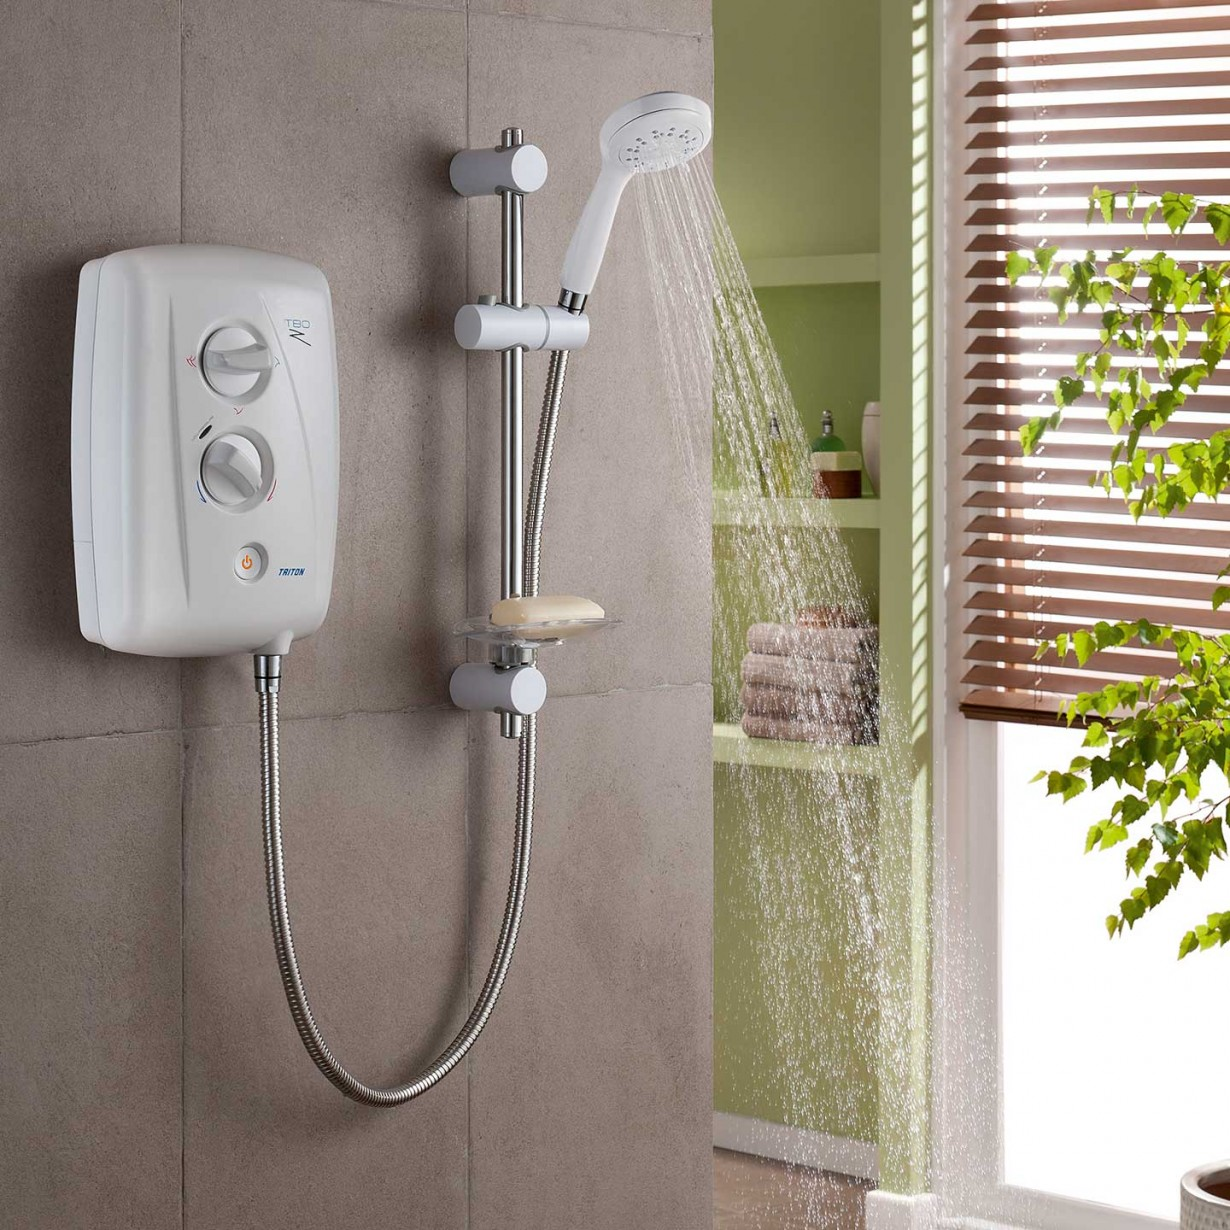 Triton   T80Z   Fast Fit   Electric shower   White Body   White rail   lifestyle